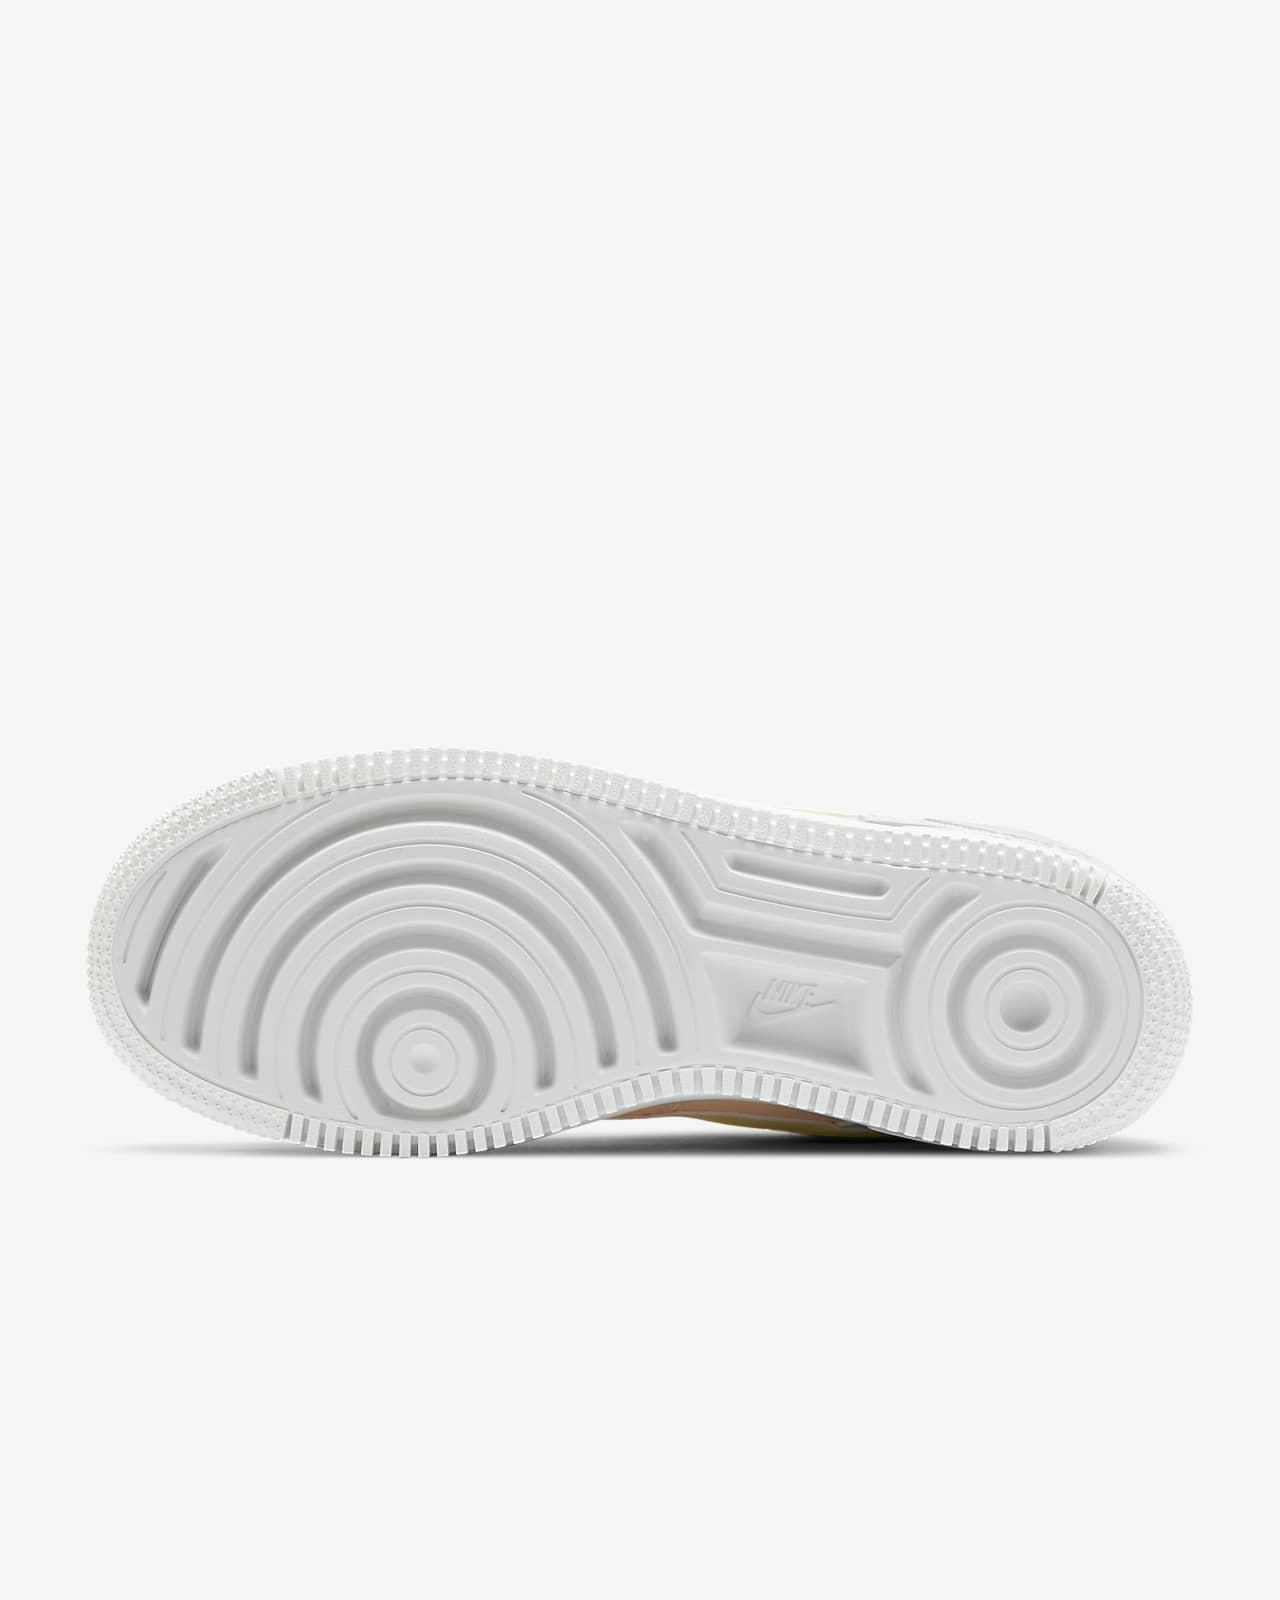 Nike Air Force 1 Shadow Women S Shoe Nike Id Layered pieces add rich texture. nike air force 1 shadow women s shoe